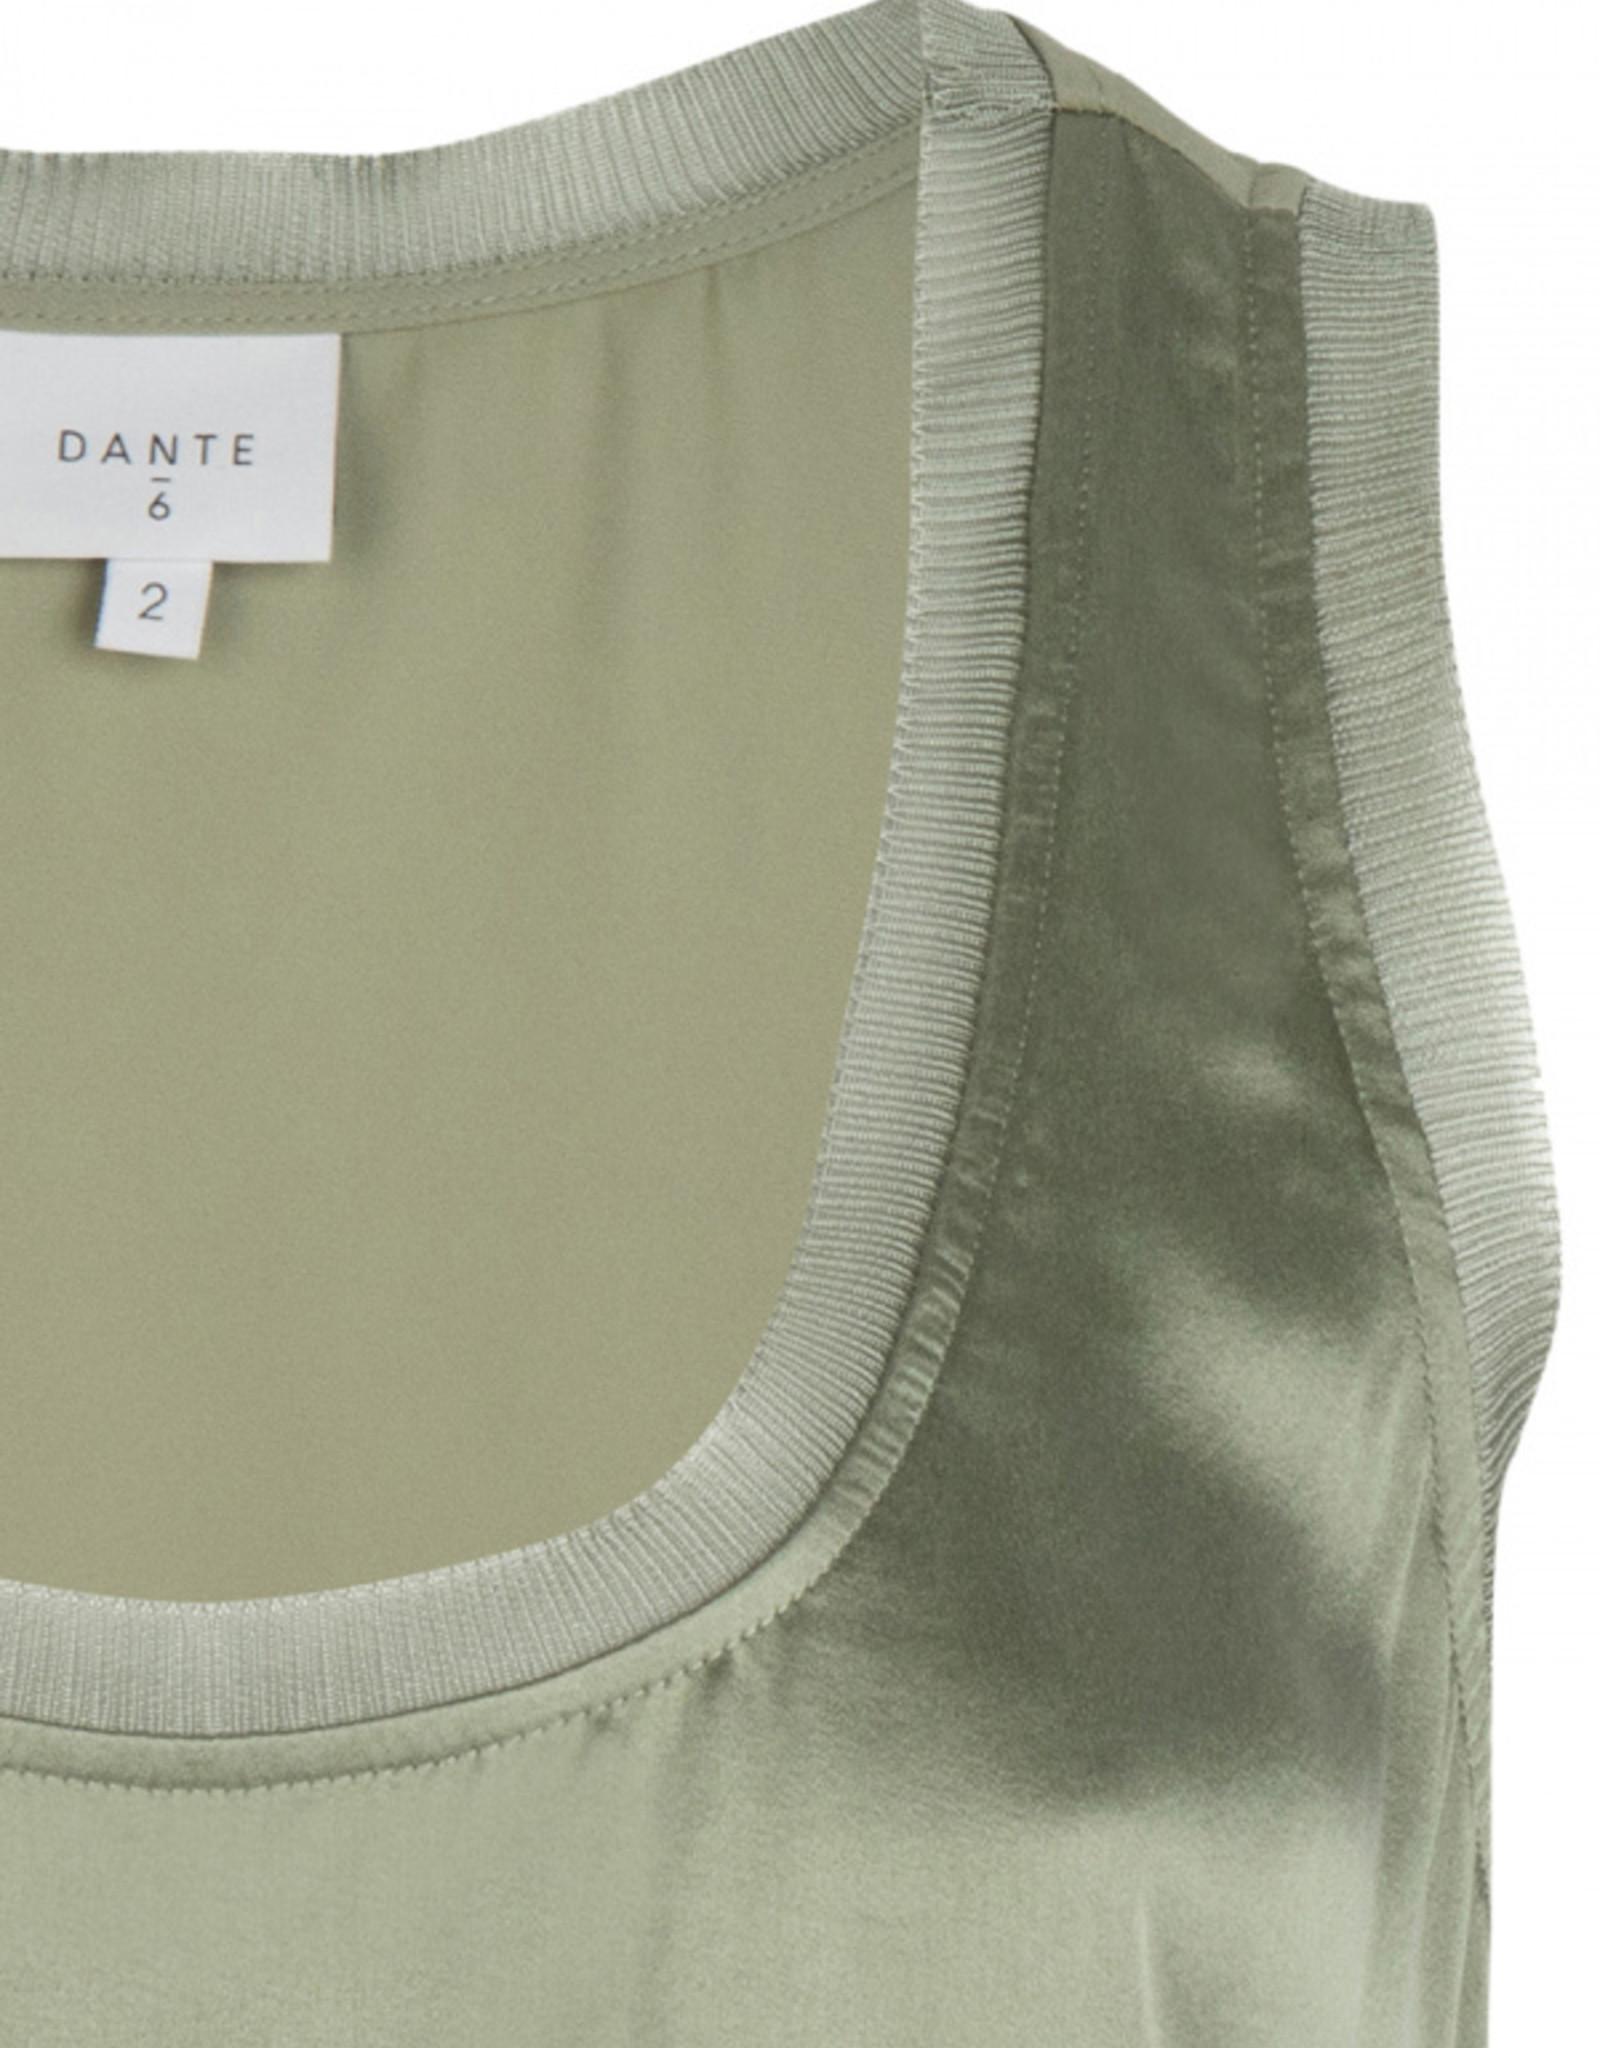 Dante6 Nava stretch silk top Sage Green